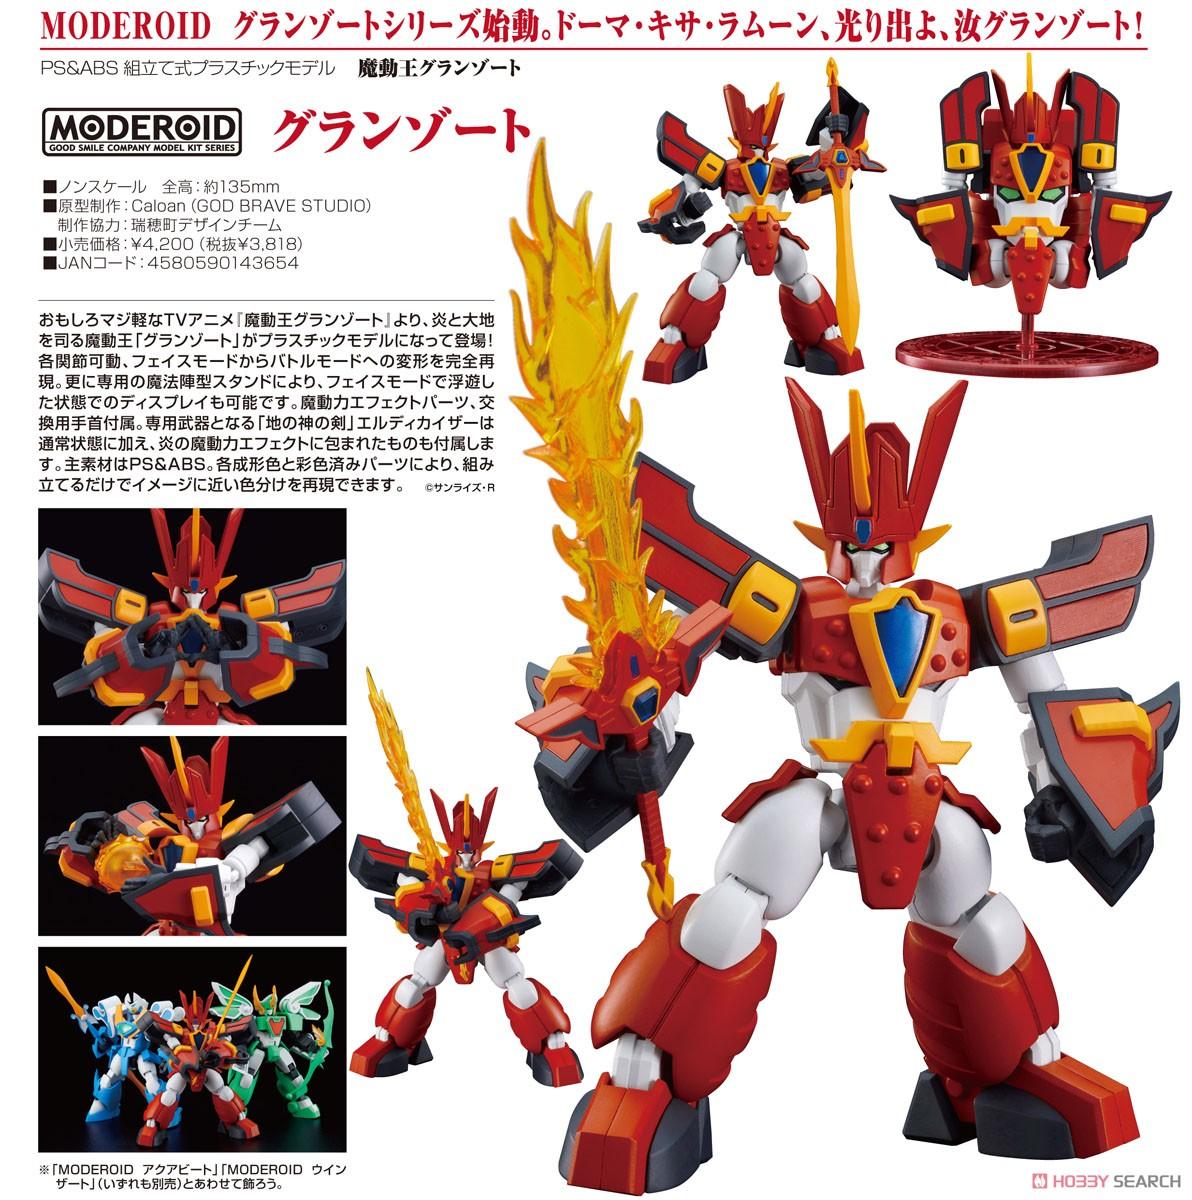 MODEROID『グランゾート』魔動王グランゾート プラモデル-008